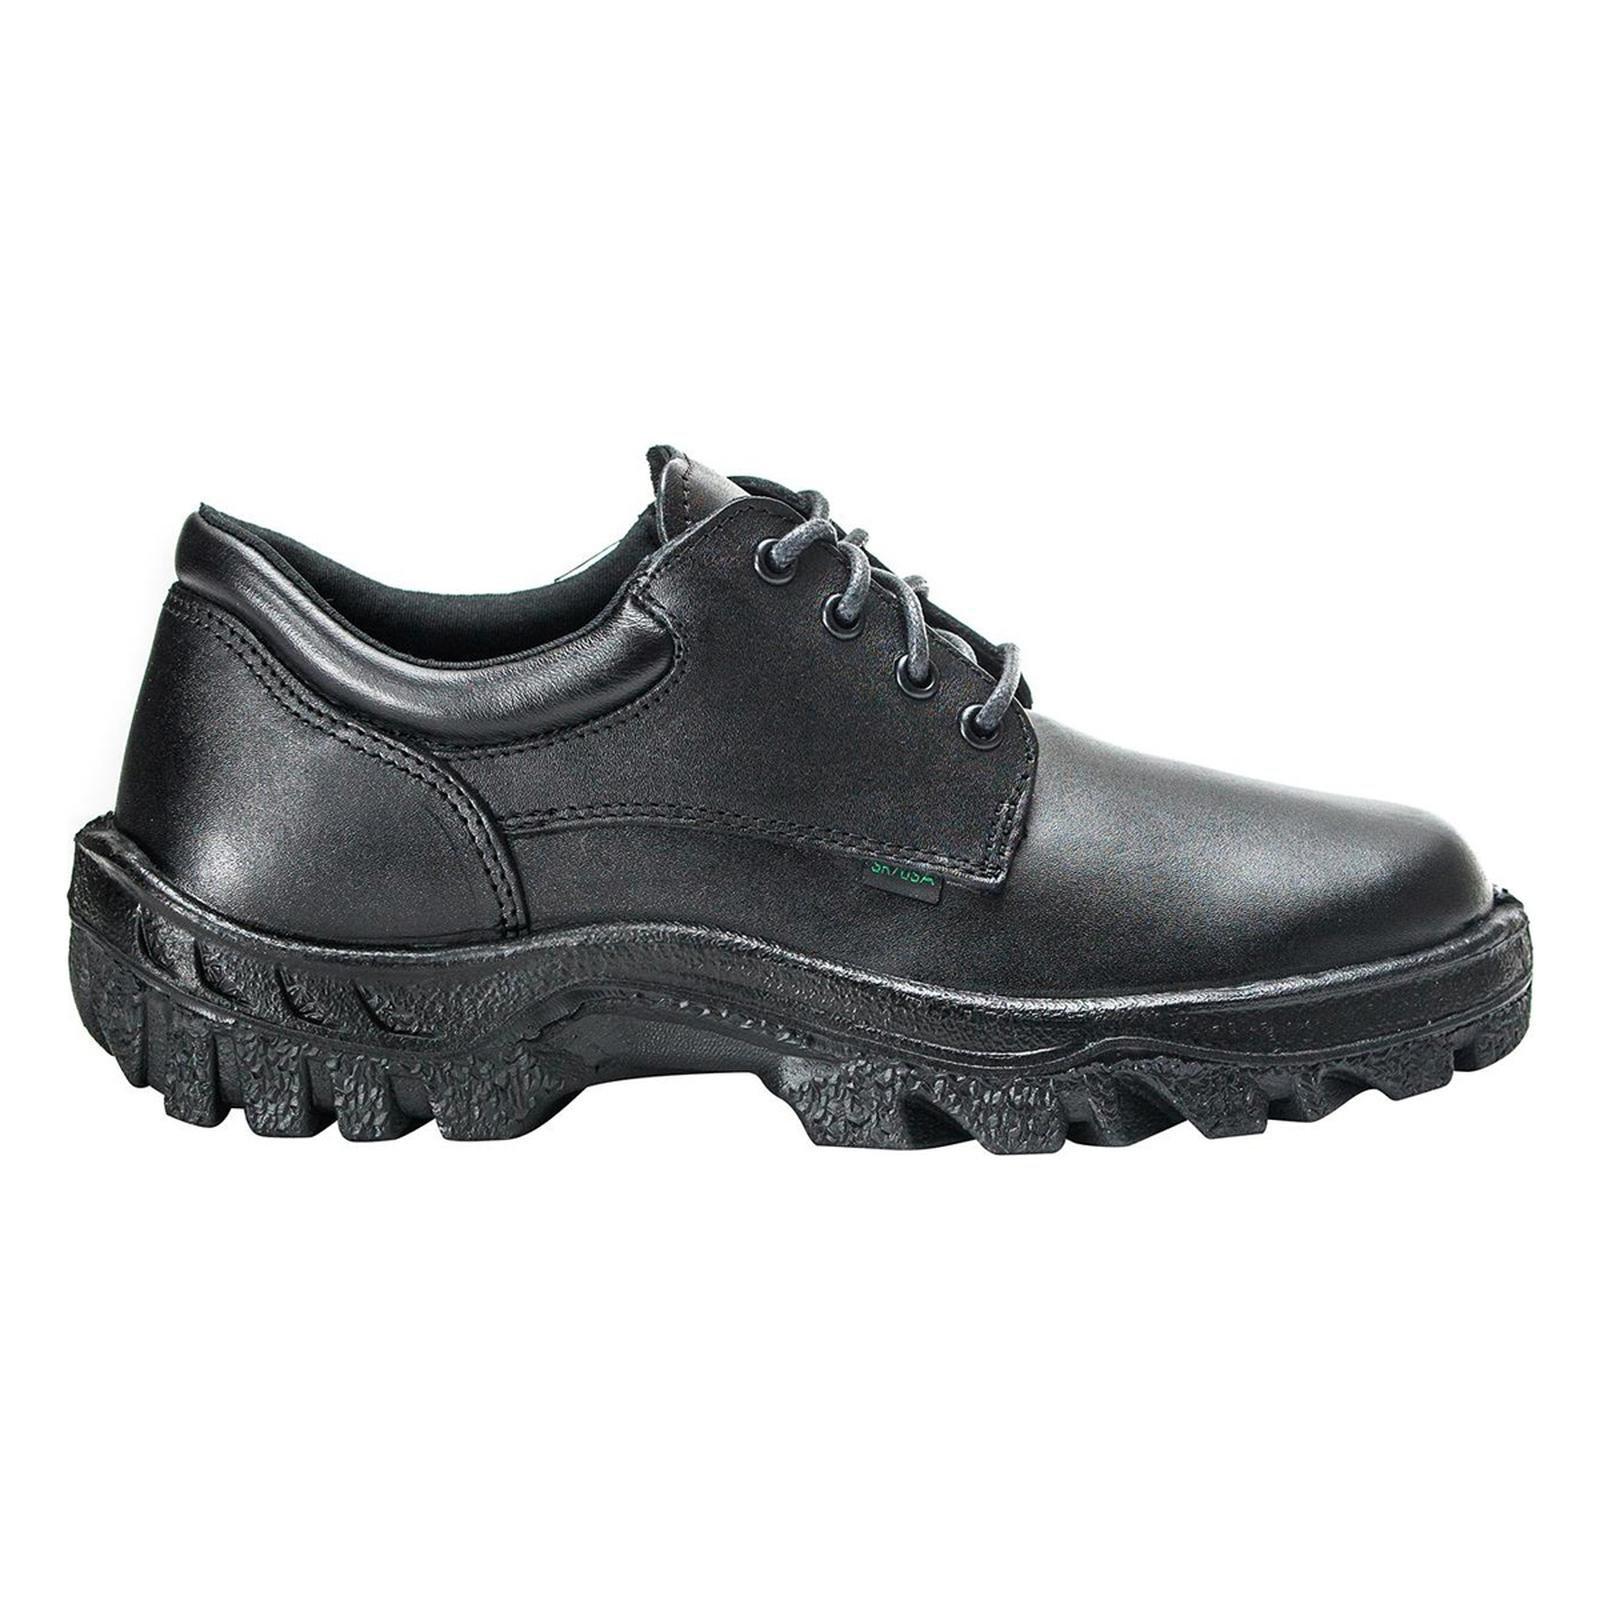 Rocky Men's Postal TMC Oxford Work Boot,Black,13 M US